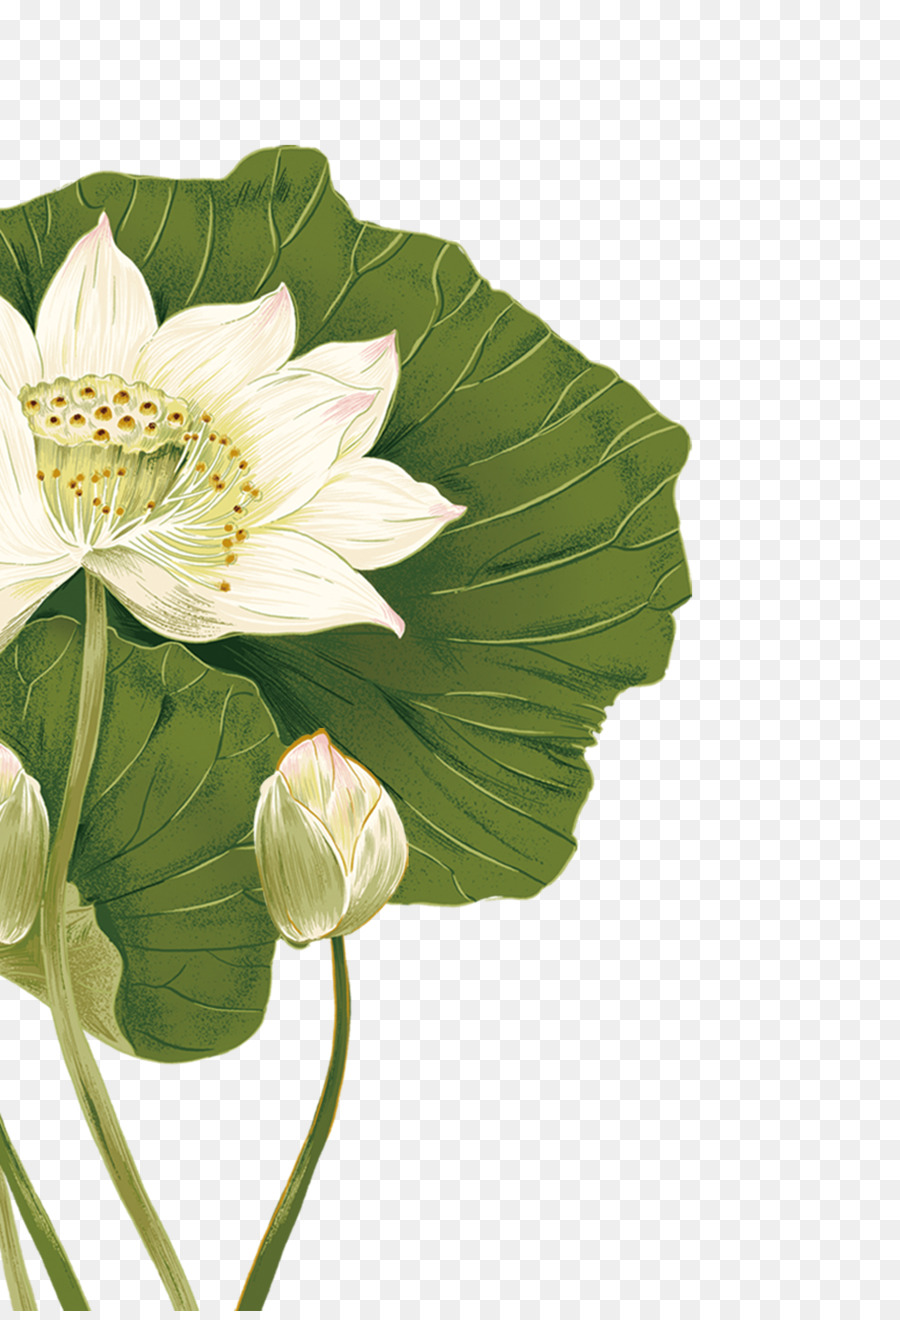 Nelumbo Nucifera Flower Illustration Lotus Png Download 1000